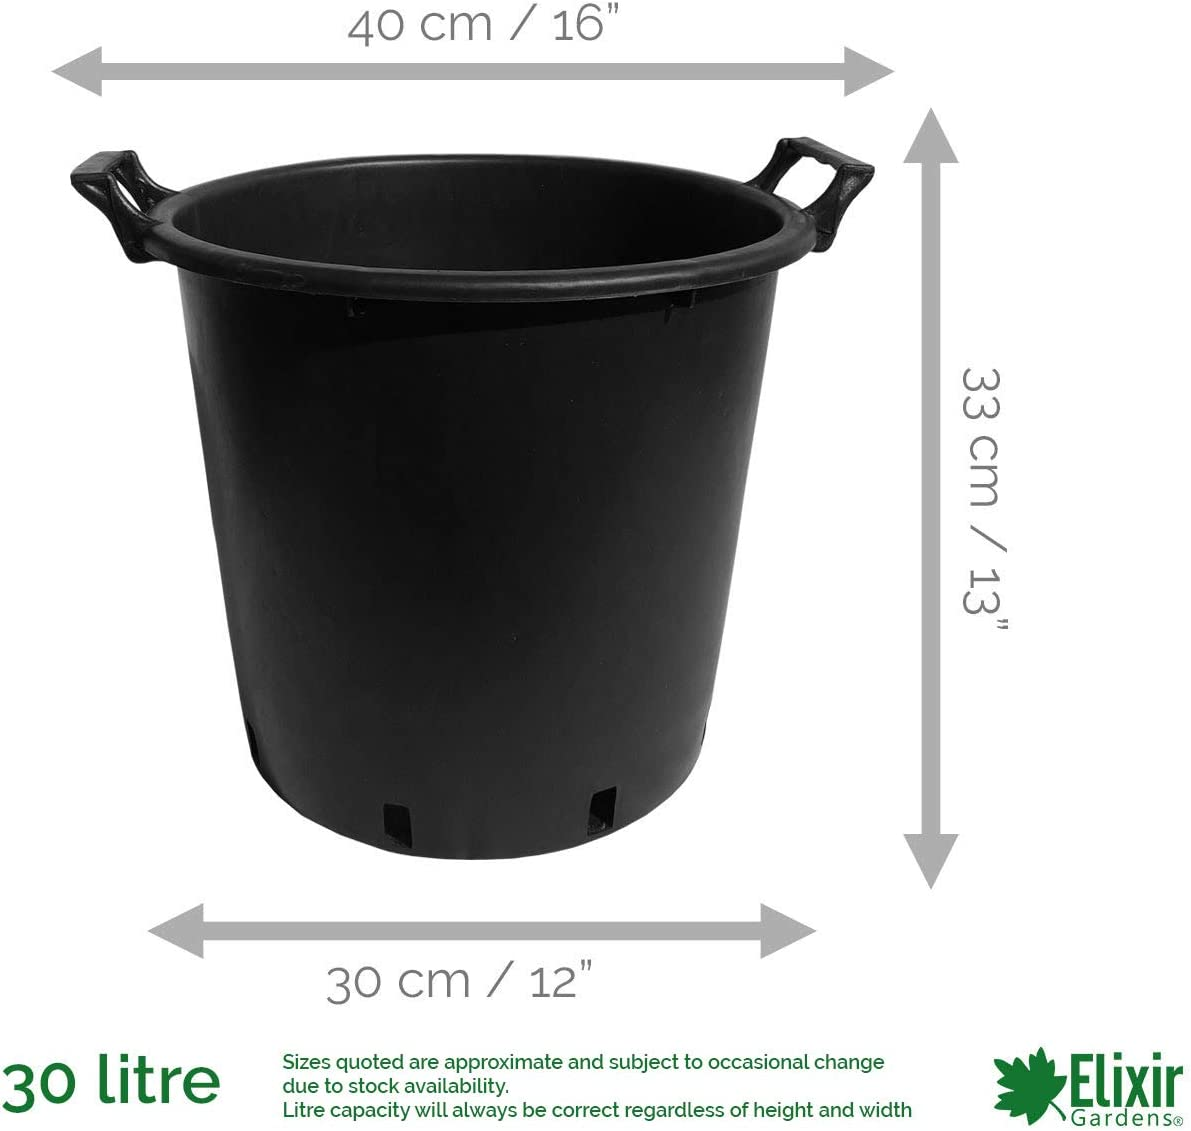 20 x 45 Litre Plant Tree Pot With Handles Heavy Duty 45L Lt Big Large Plastic